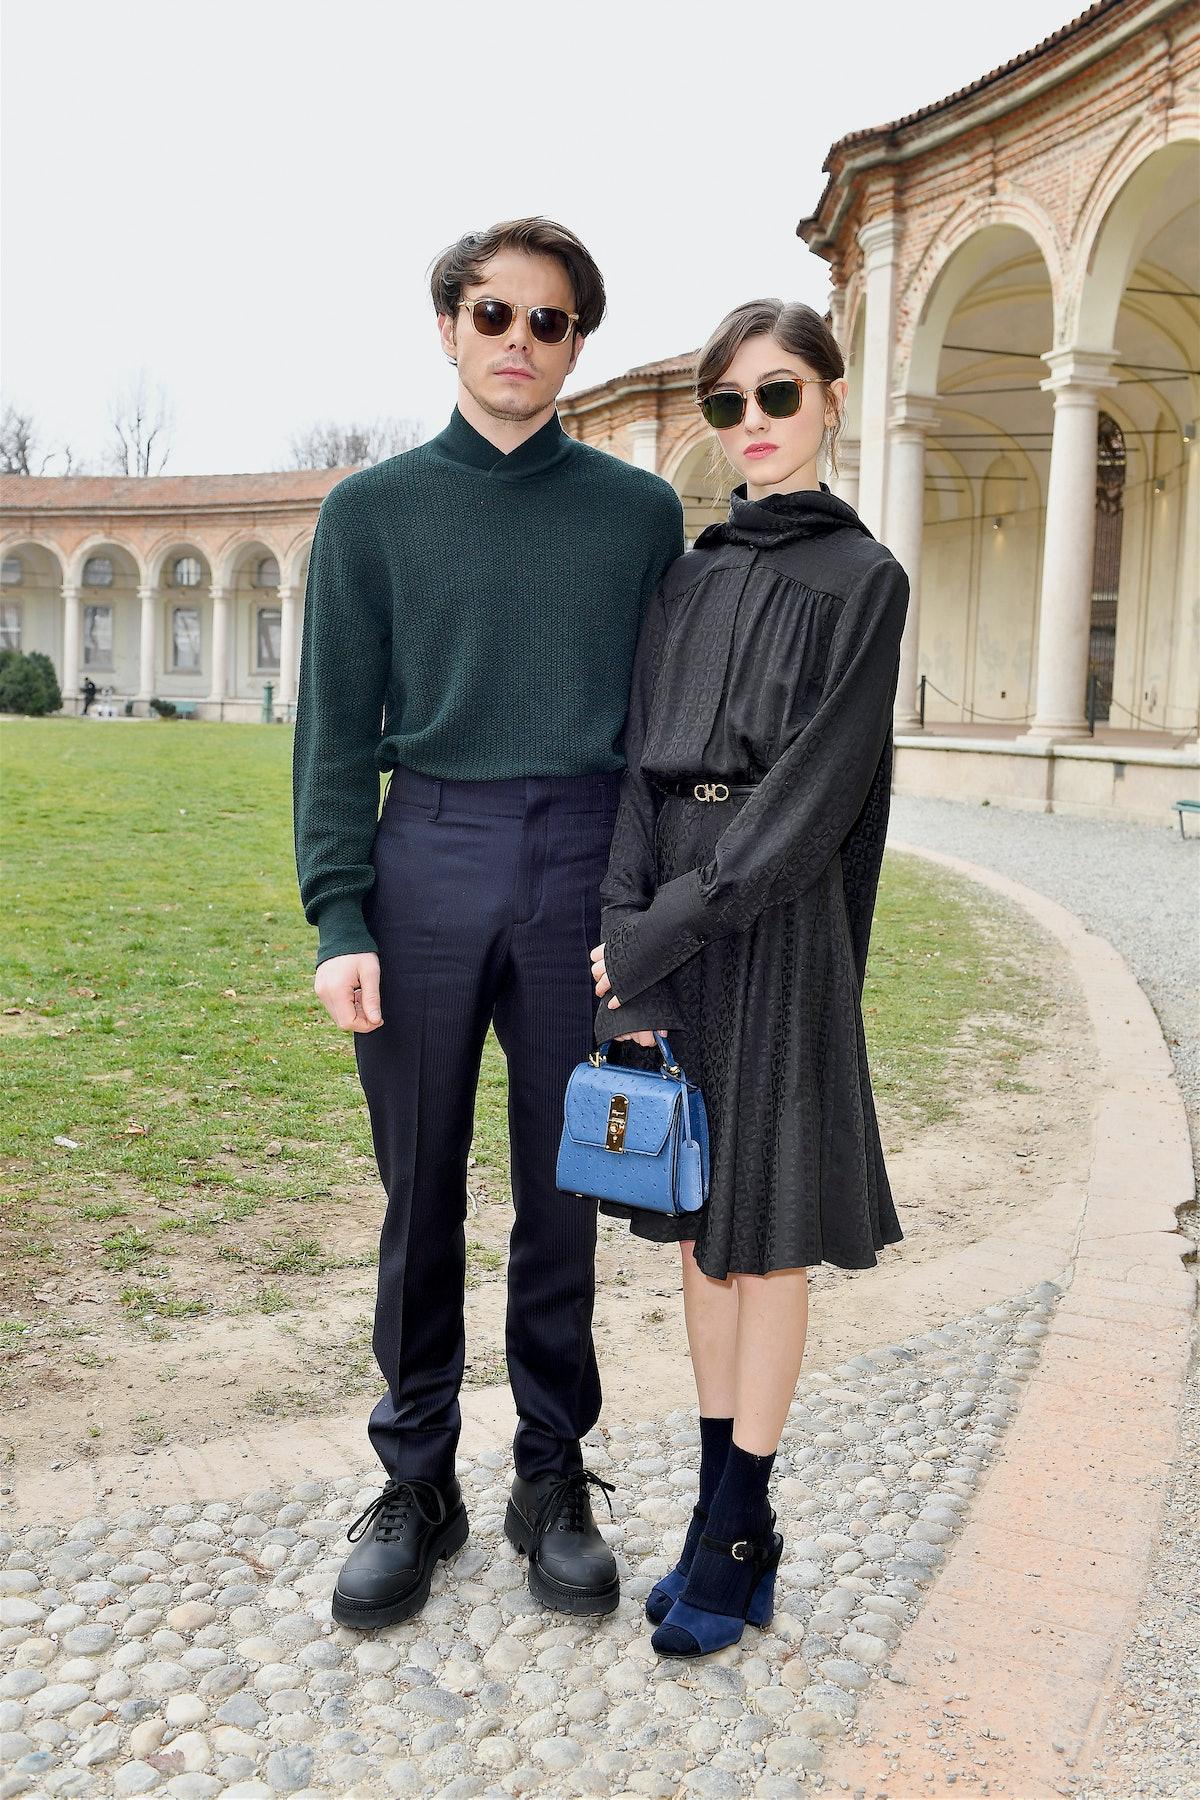 Salvatore Ferragamo - Arrivals: Milan Fashion Week Autumn/Winter 2019/20